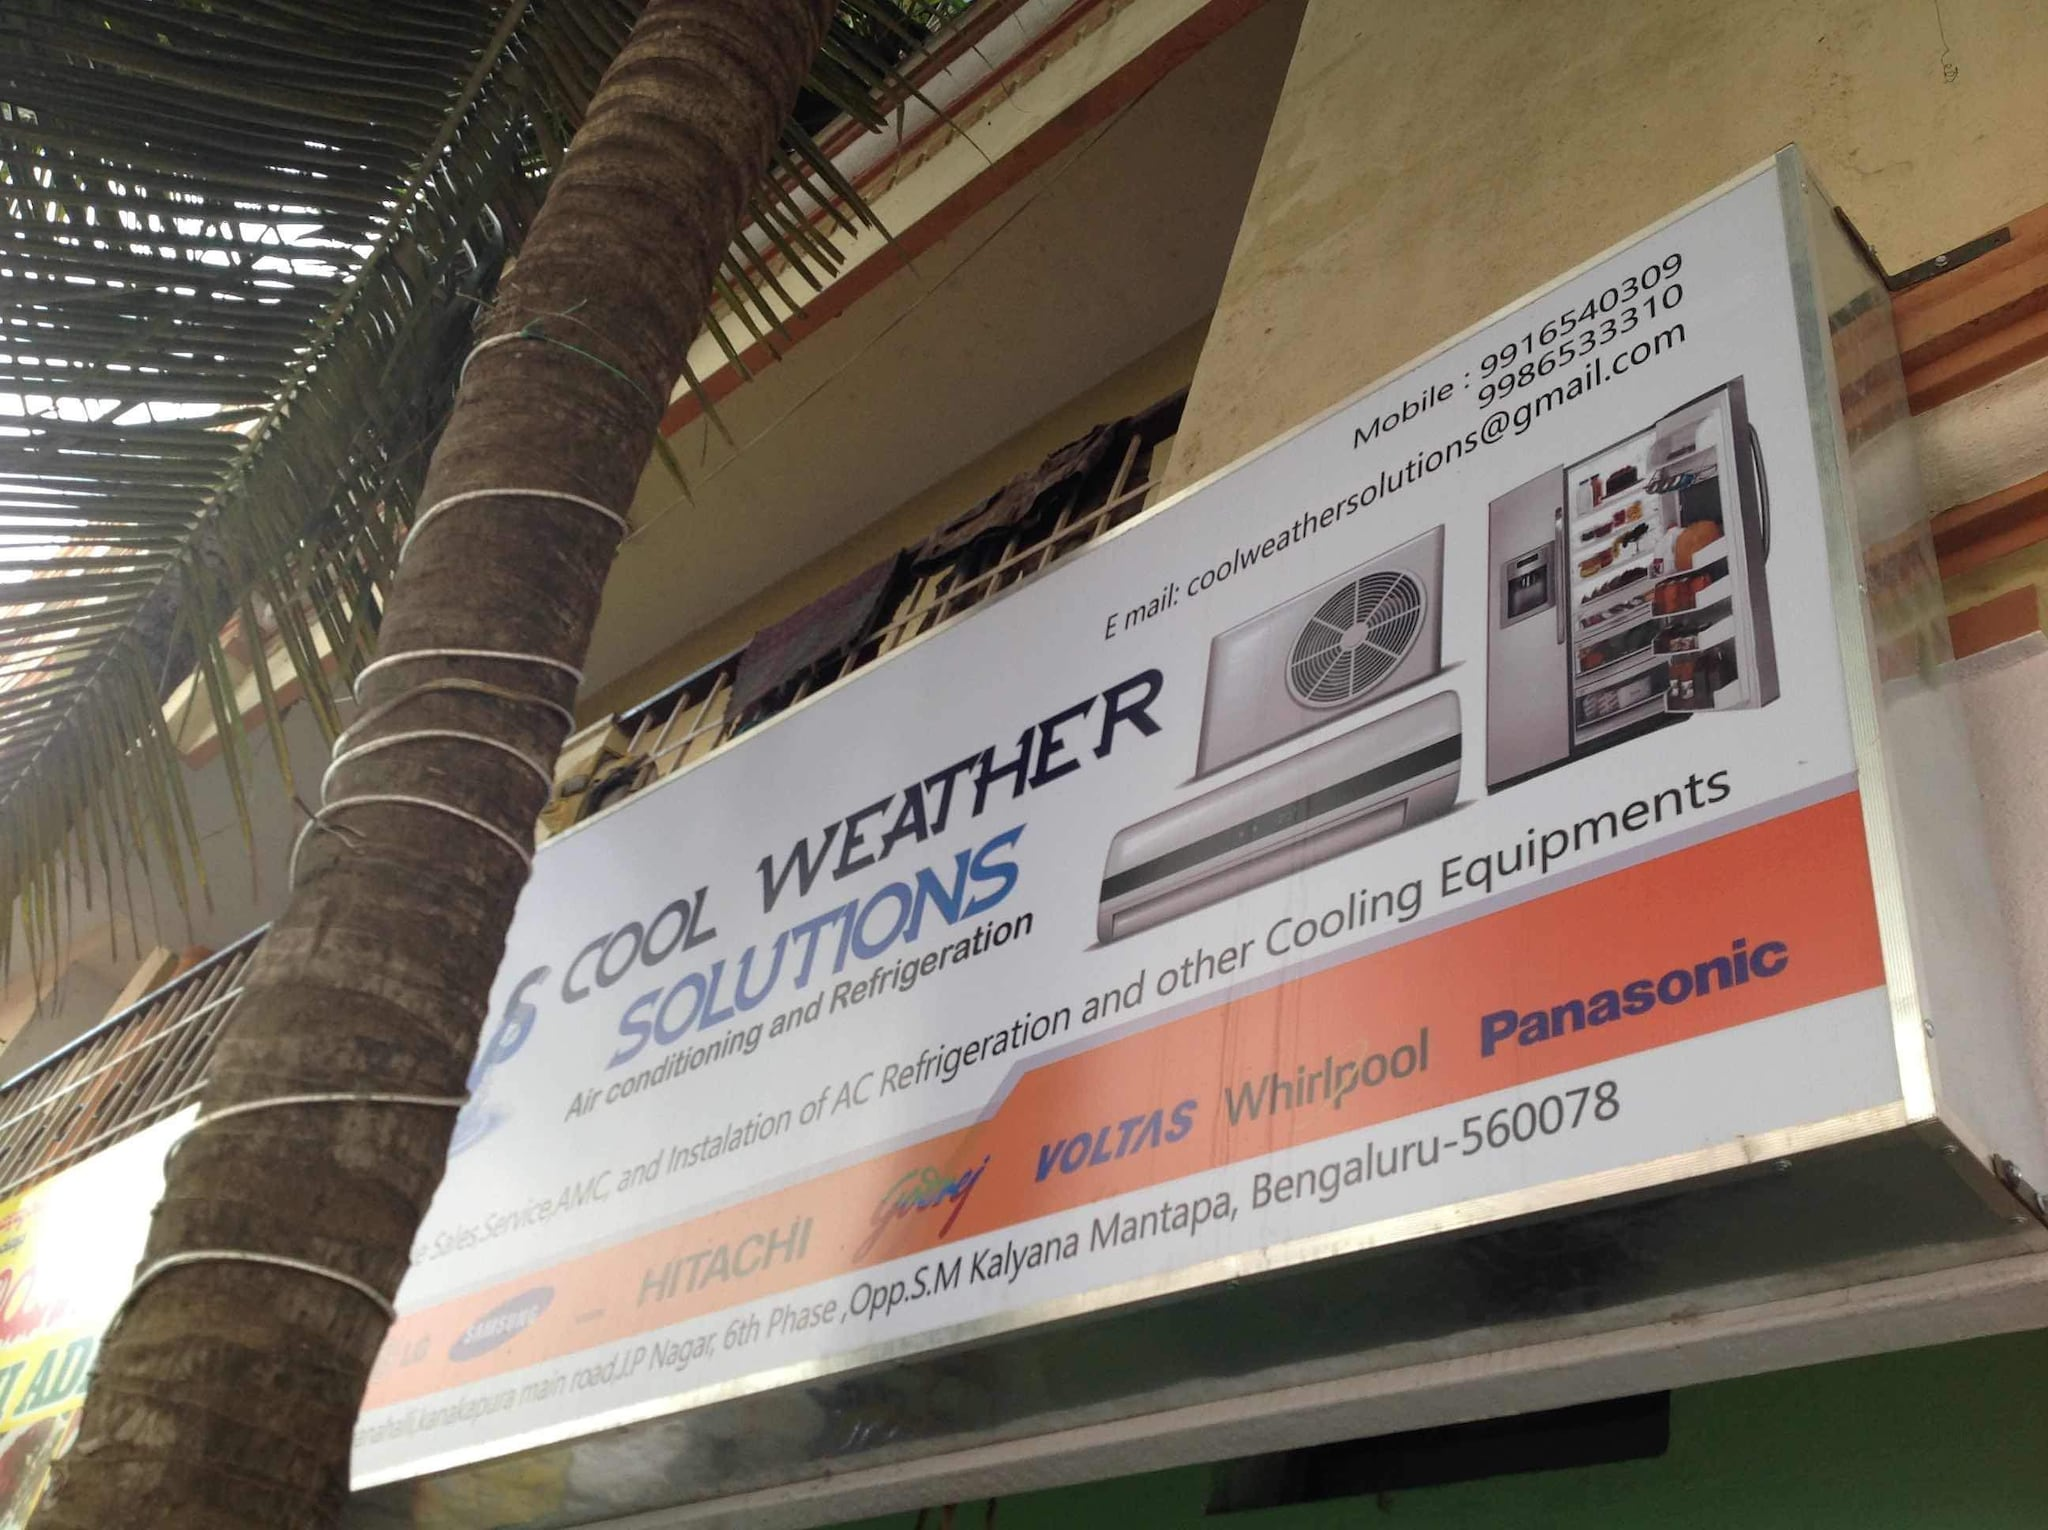 Top Godrej Refrigerator Repairing in Doddaballapur - Best